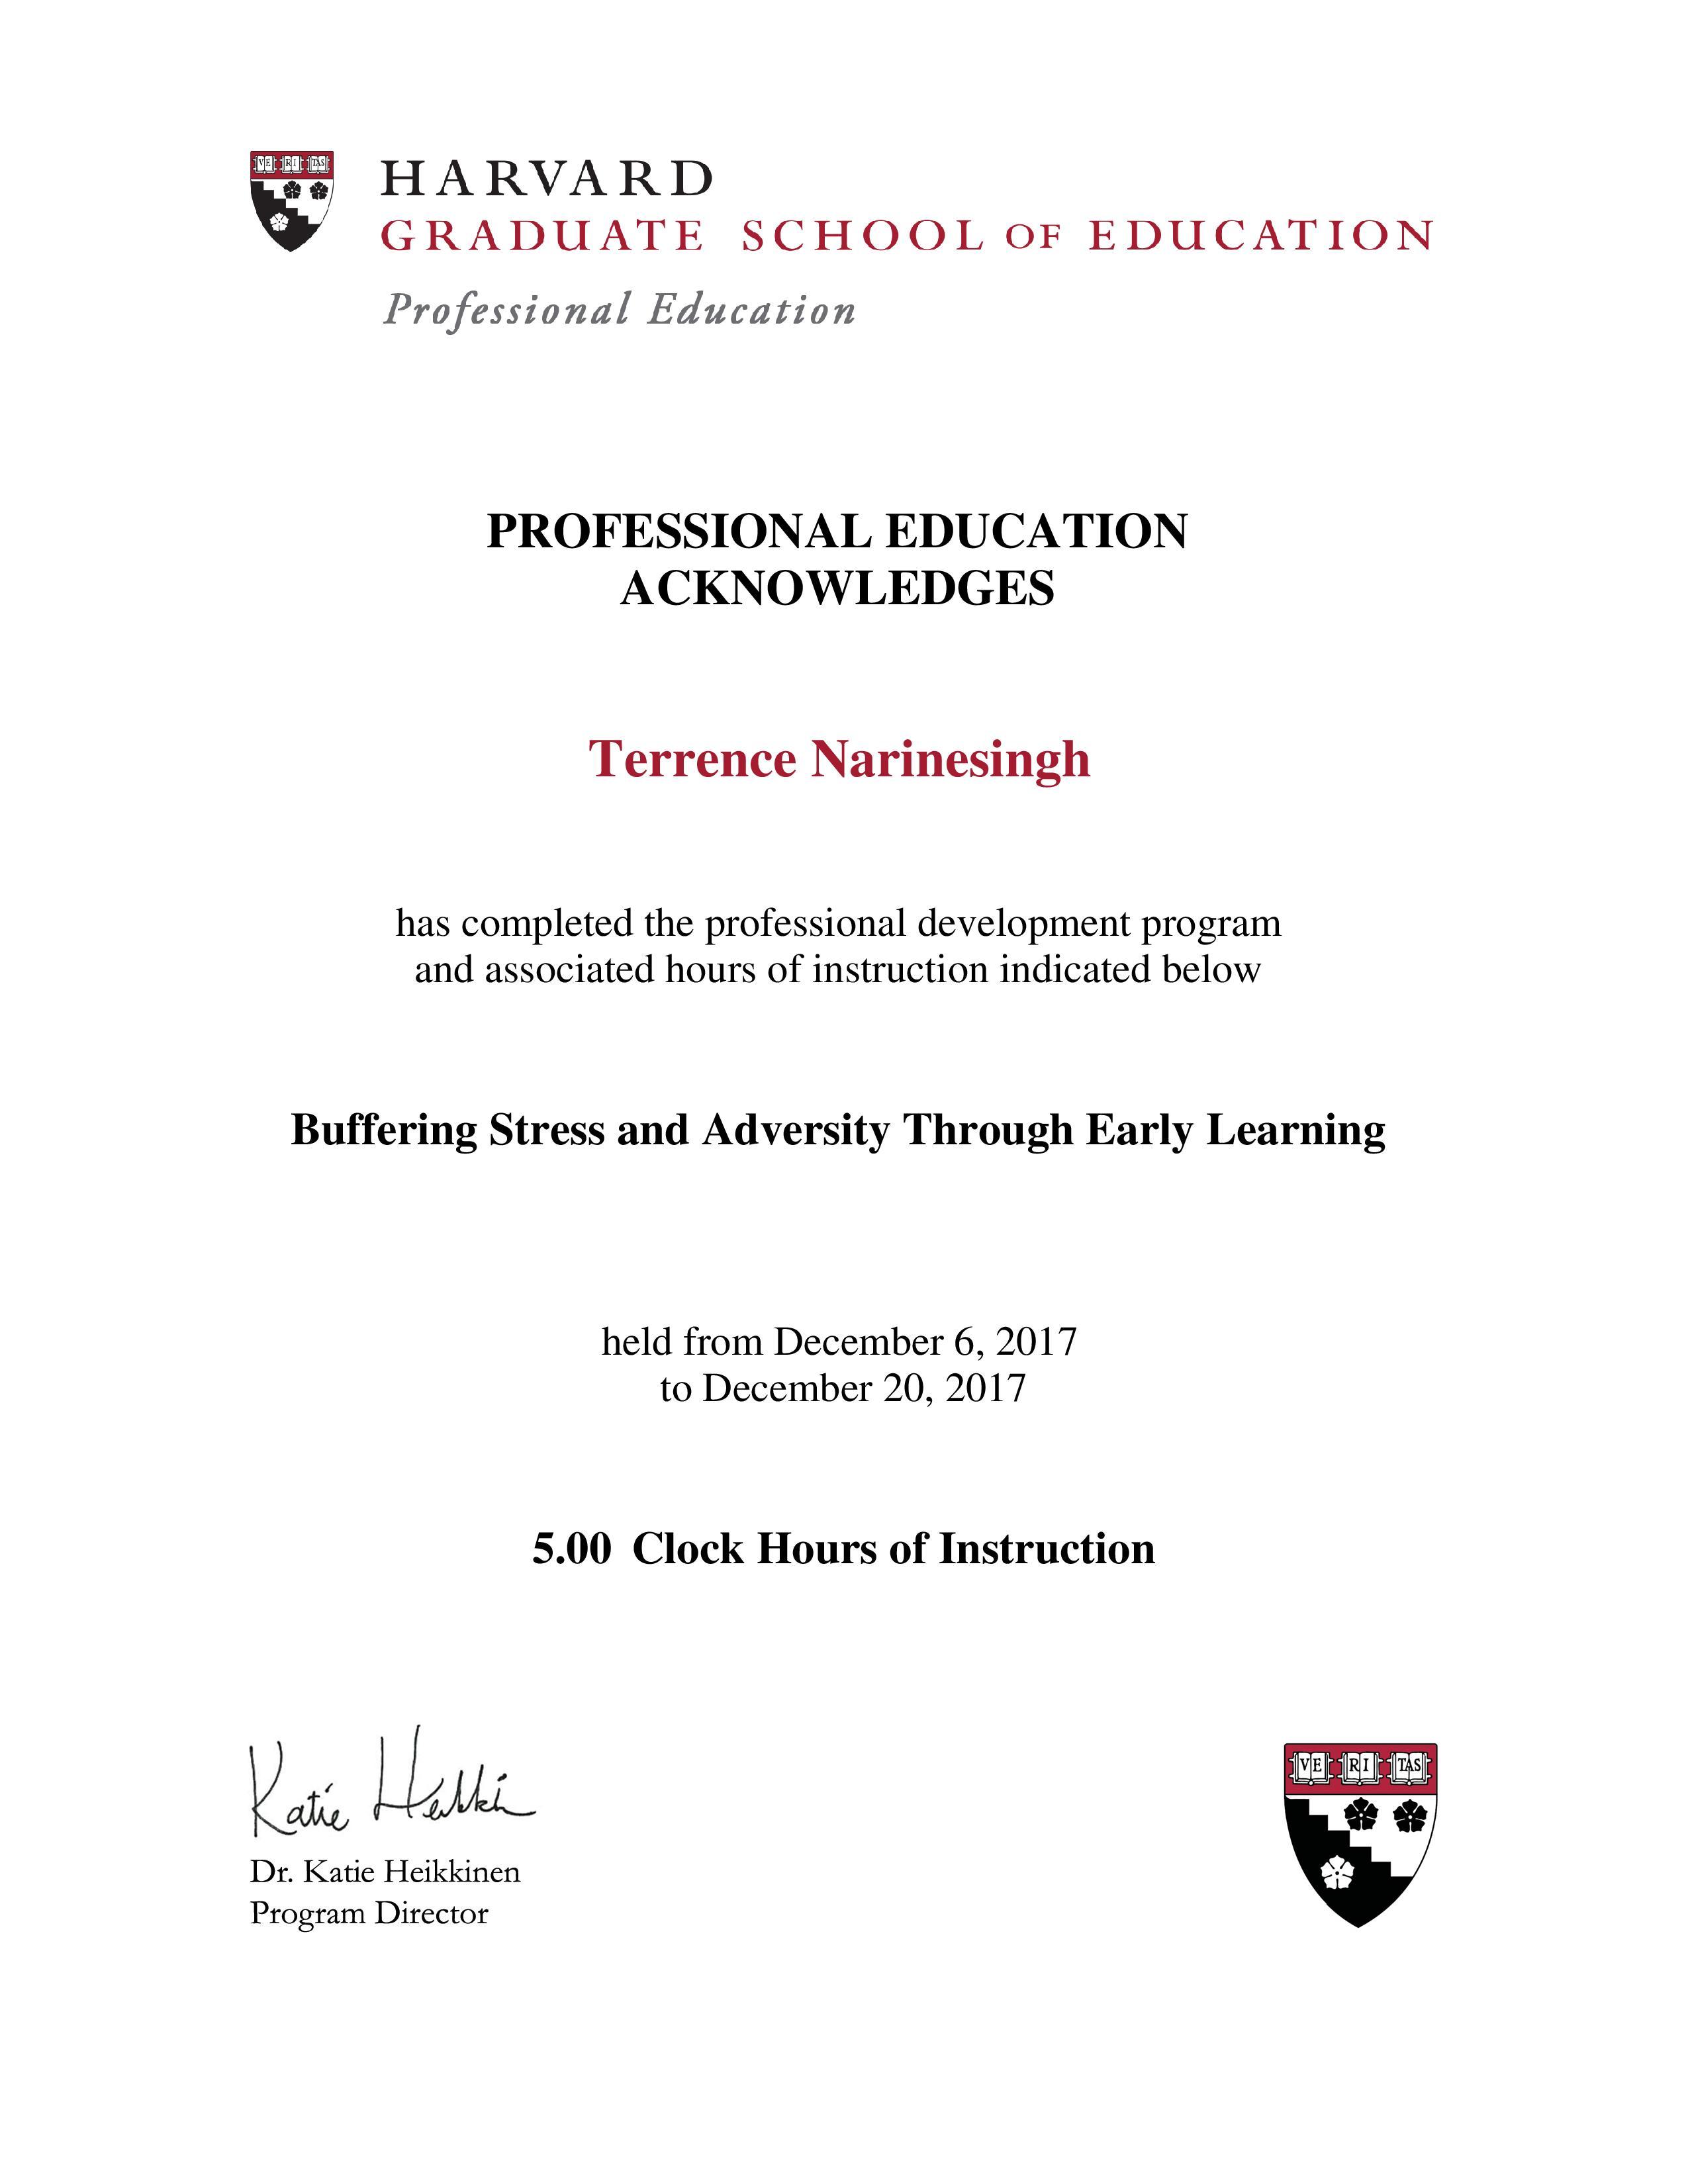 Terrence Narinesinghterrence Narinesingh Harvard Certificate For